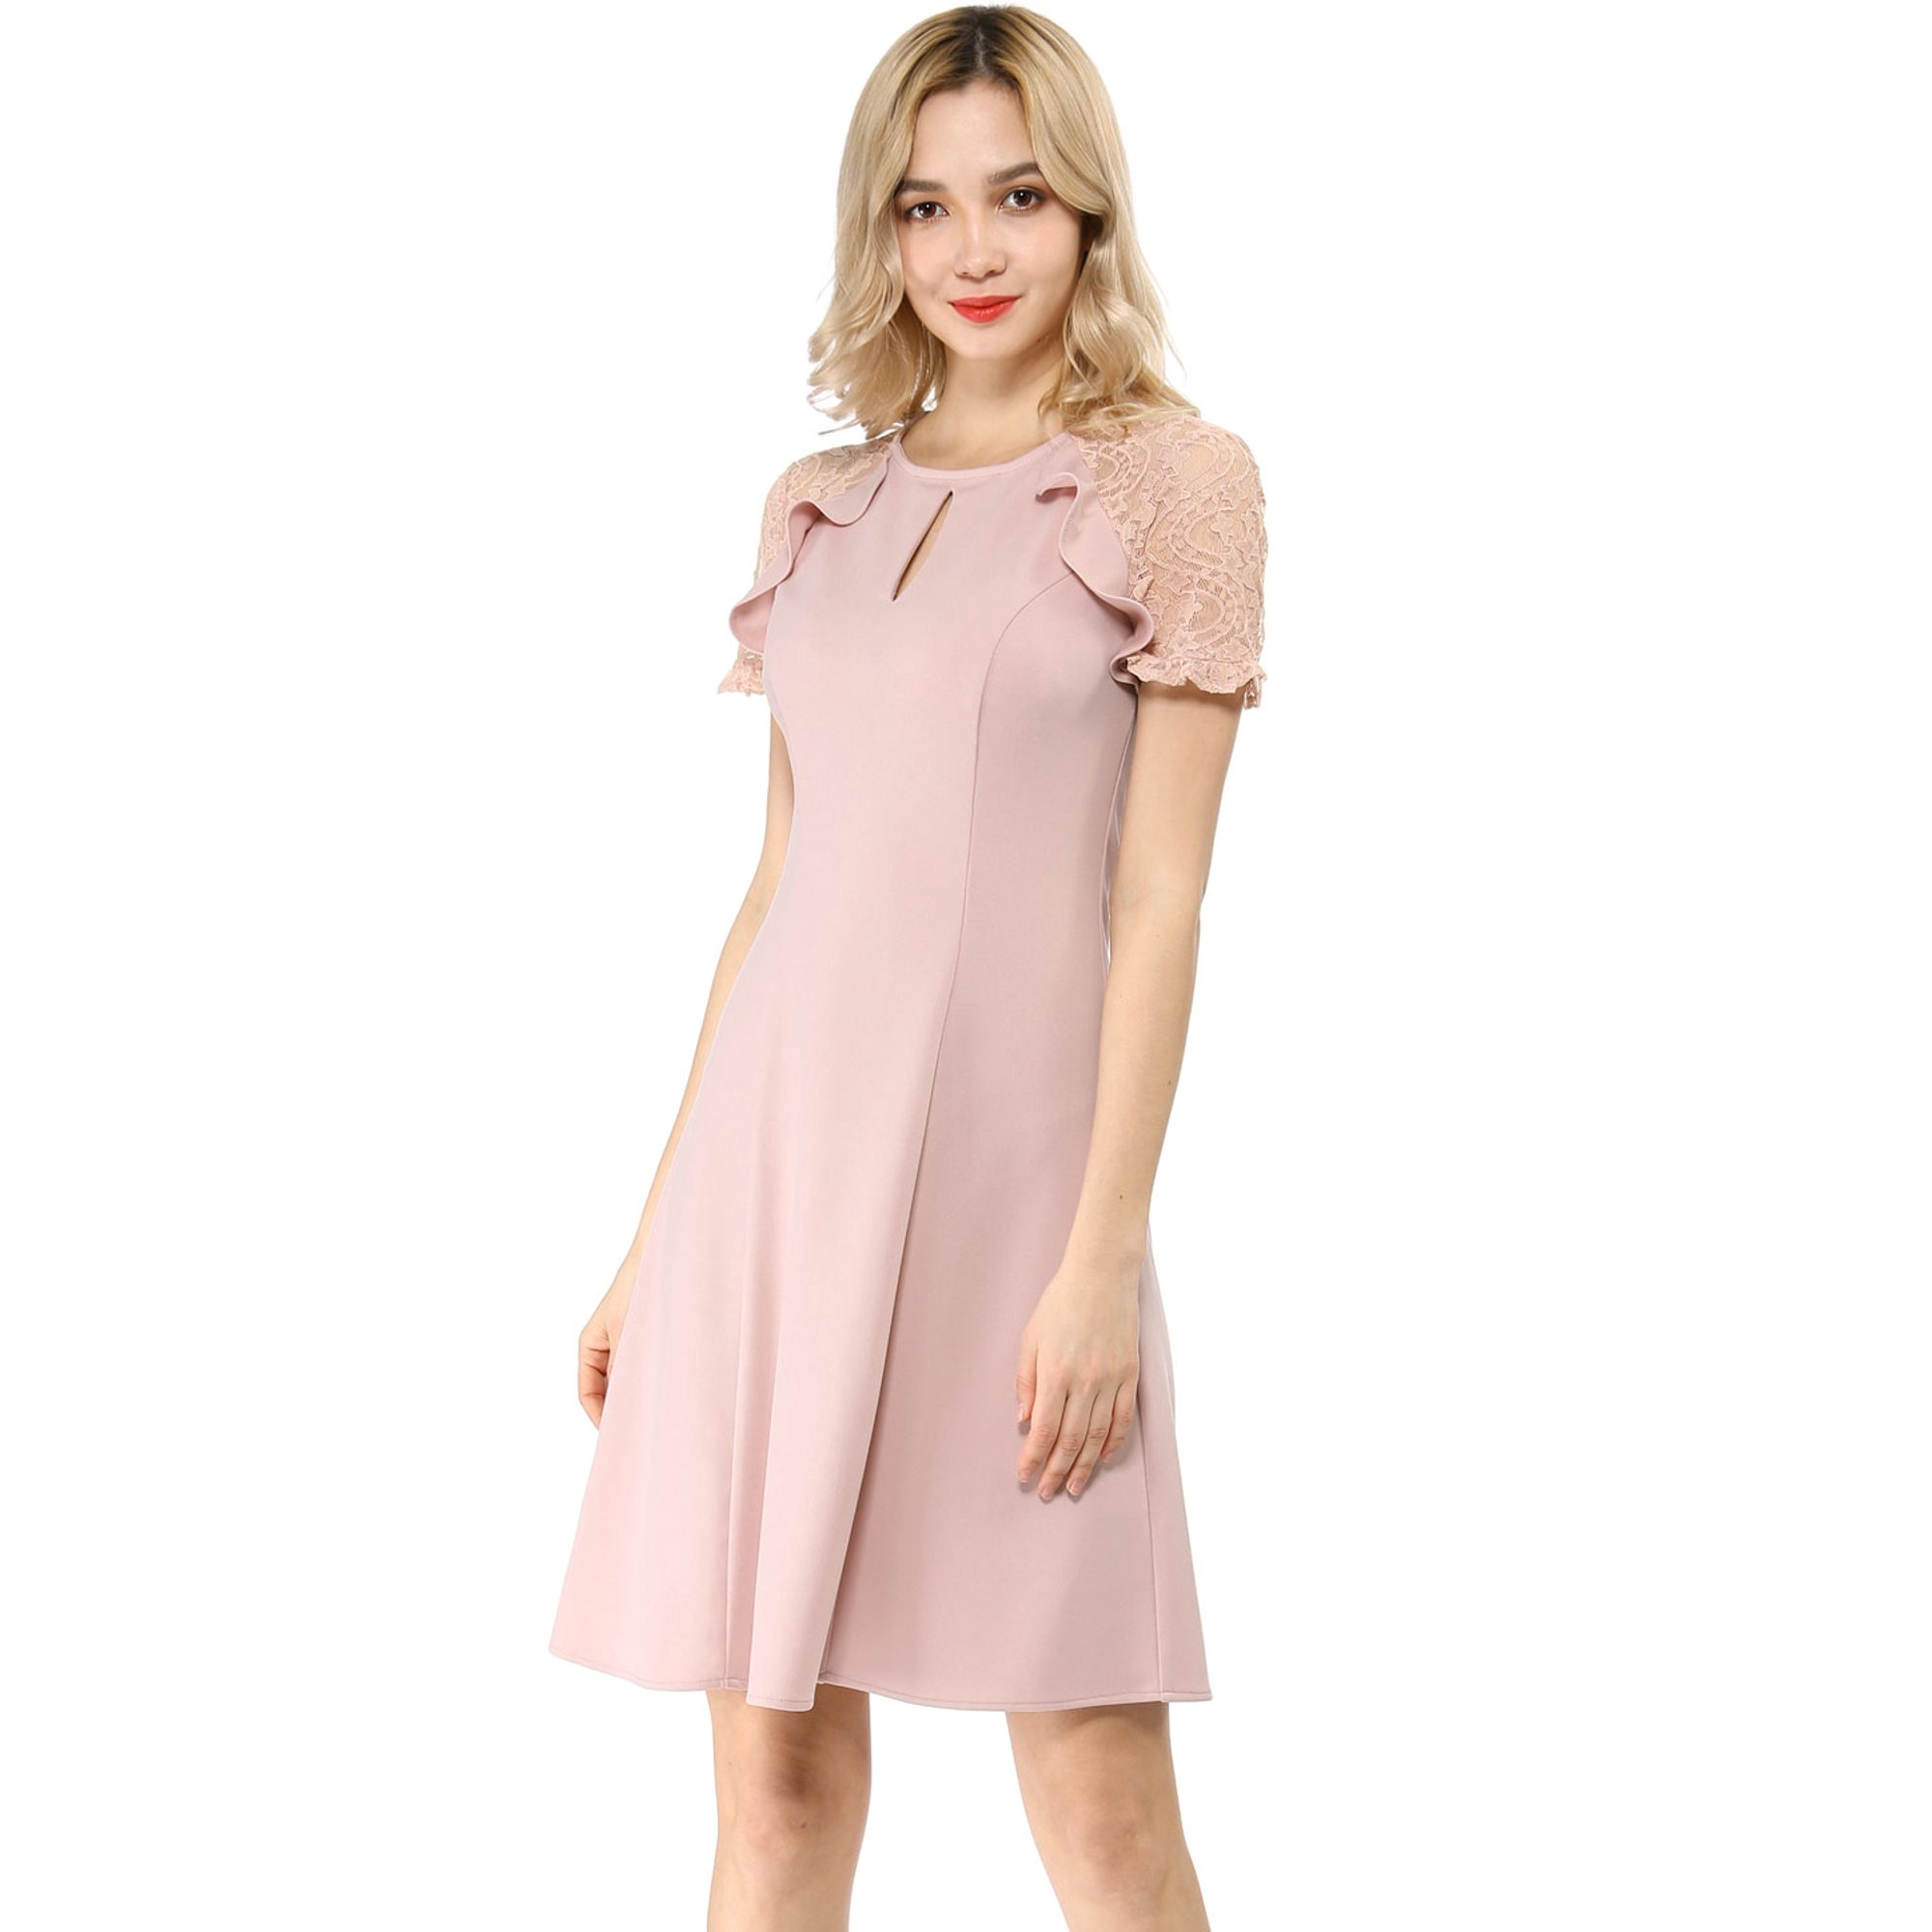 4b1edf2b4 Women's Keyhole Ruffle Lace Sleeve Fit and Flare Dress Pink L (US 14) |  Walmart Canada